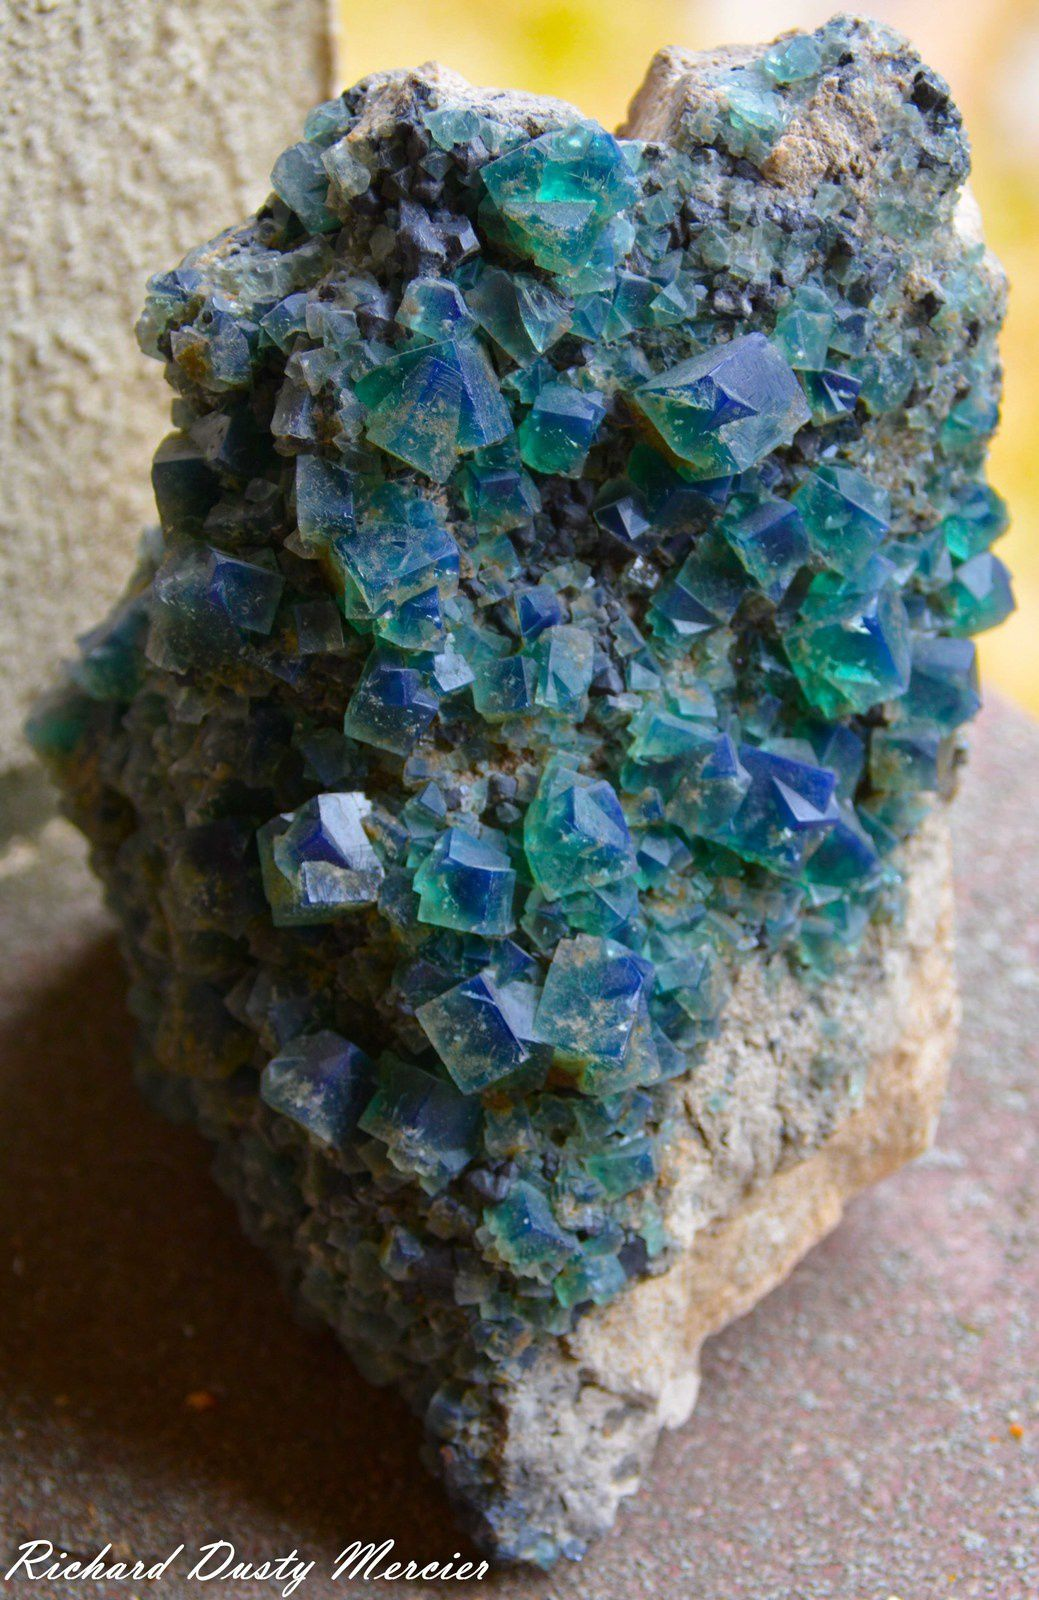 Fluorite (Fluorine) from Rogerley mine, Durham, UK (GB) (size: Museum)